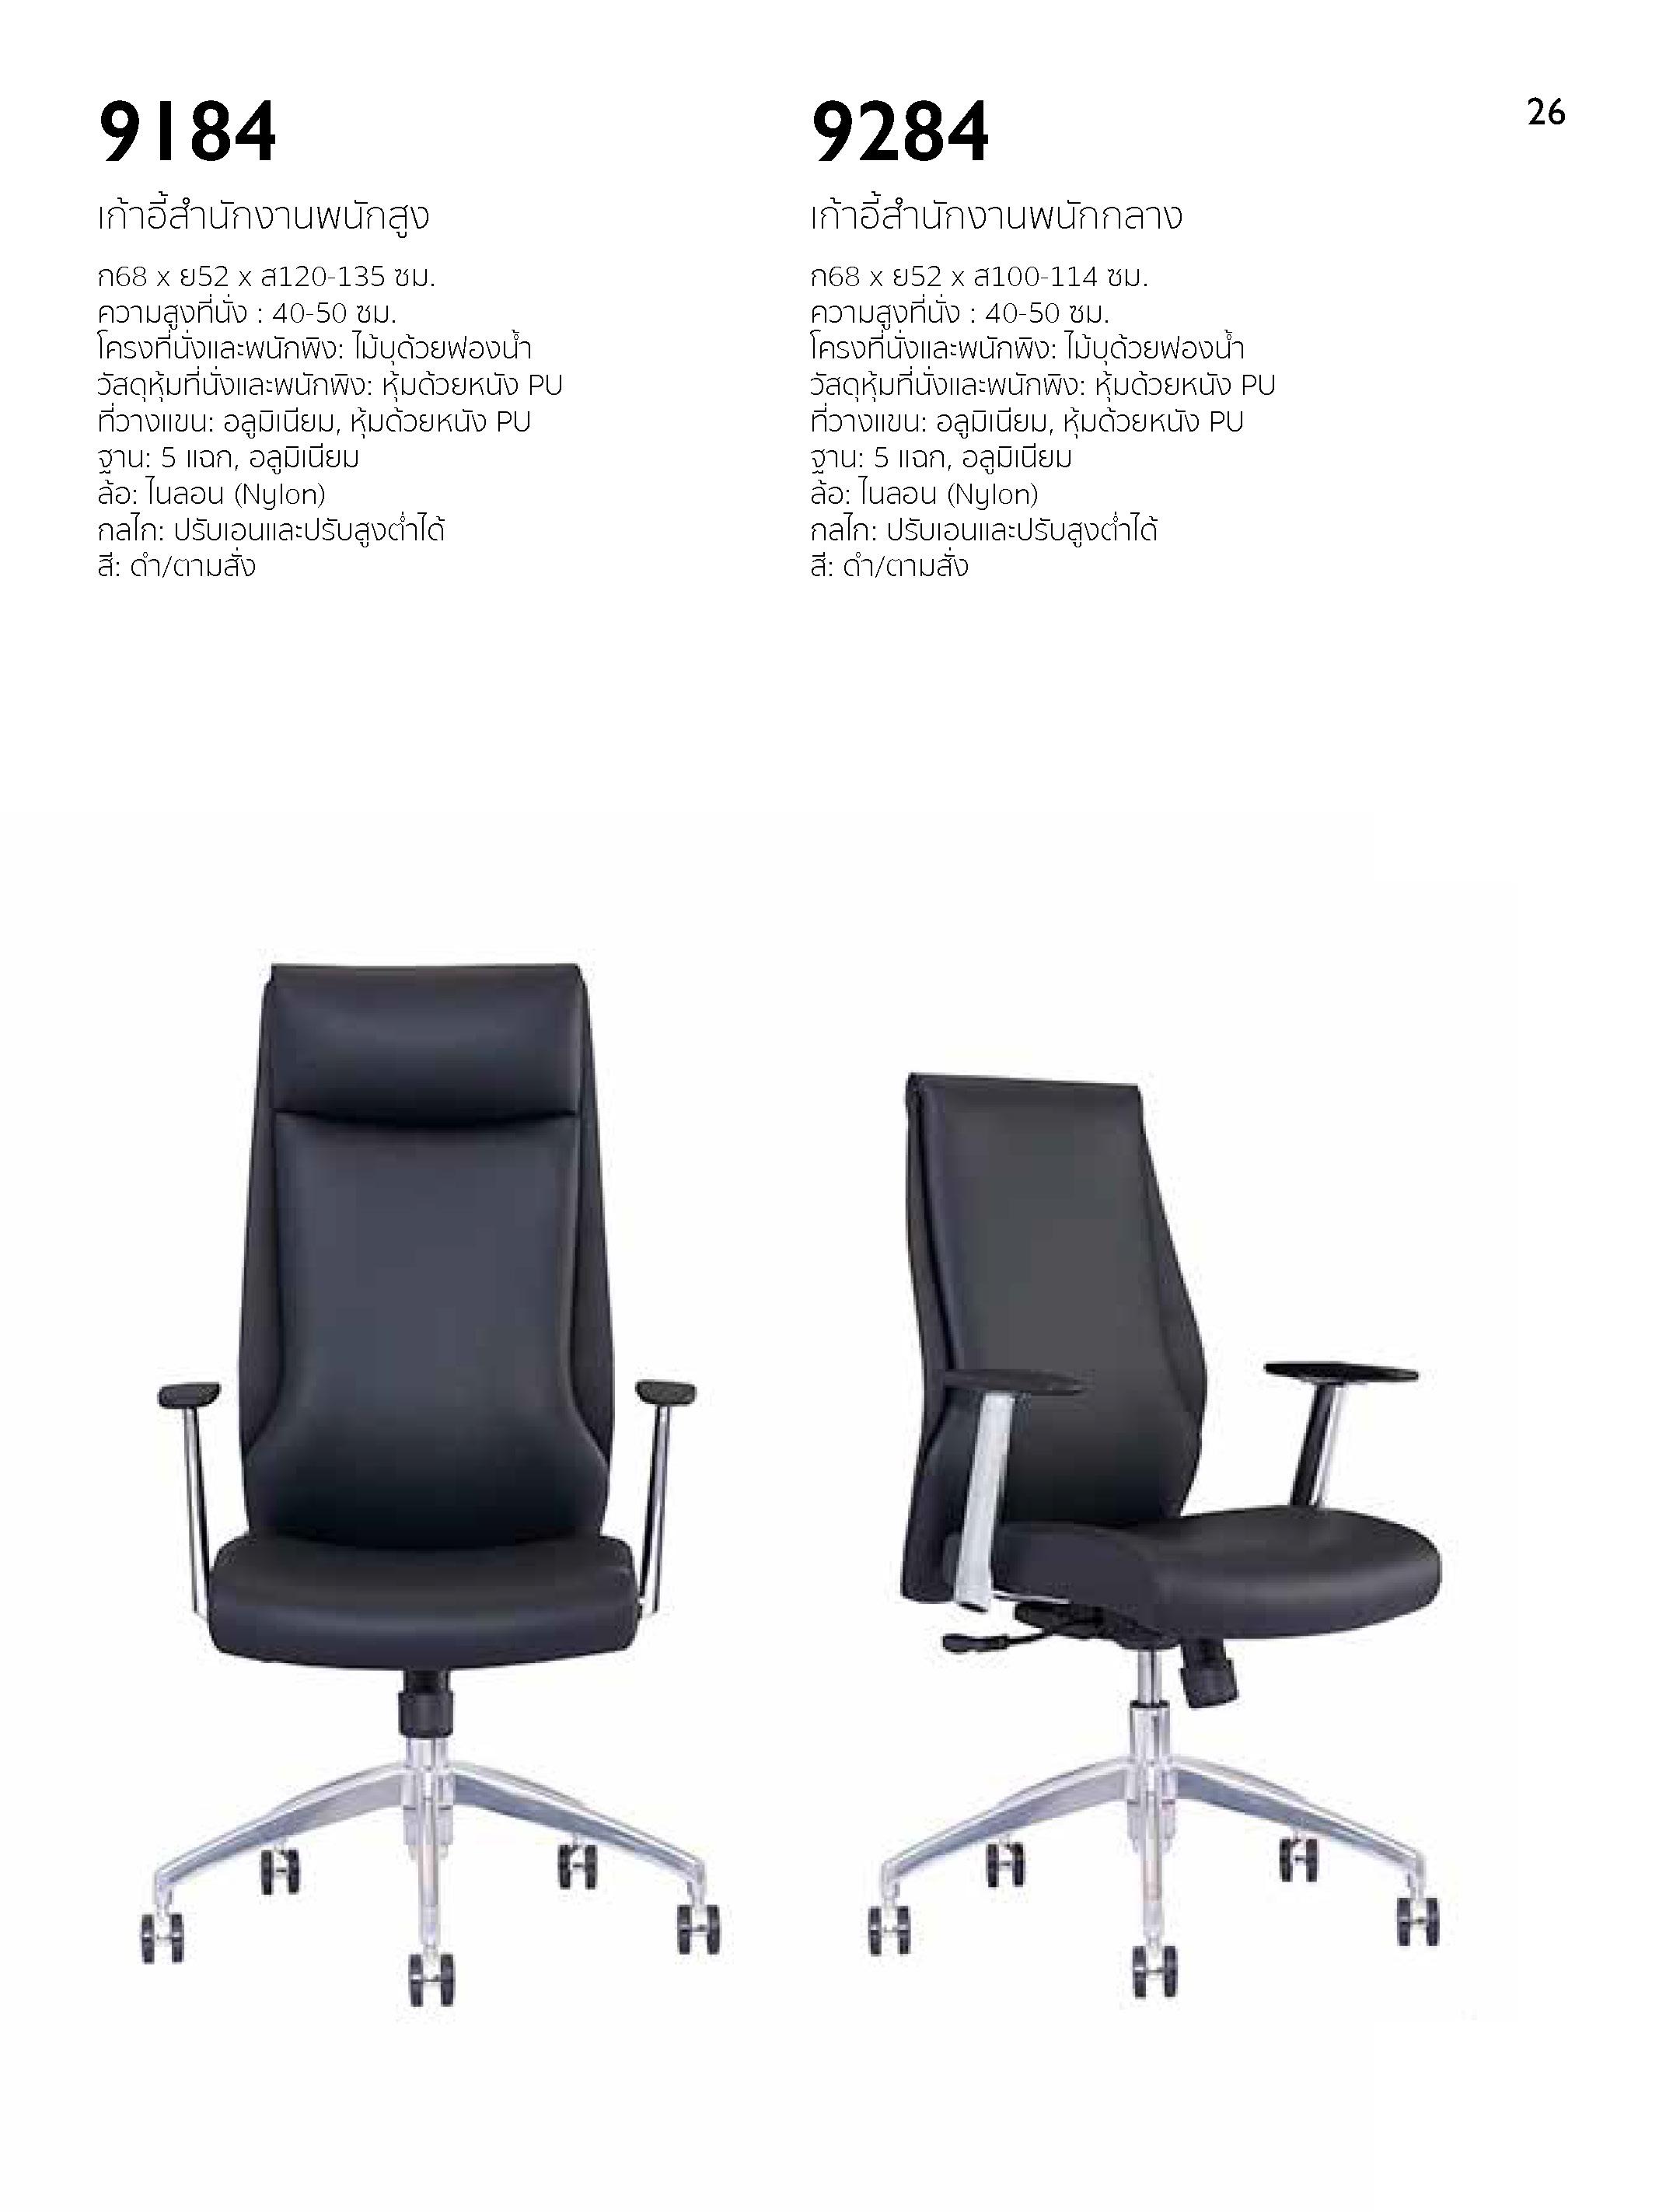 Top Furniture Catalog 2019_Page_61.jpg